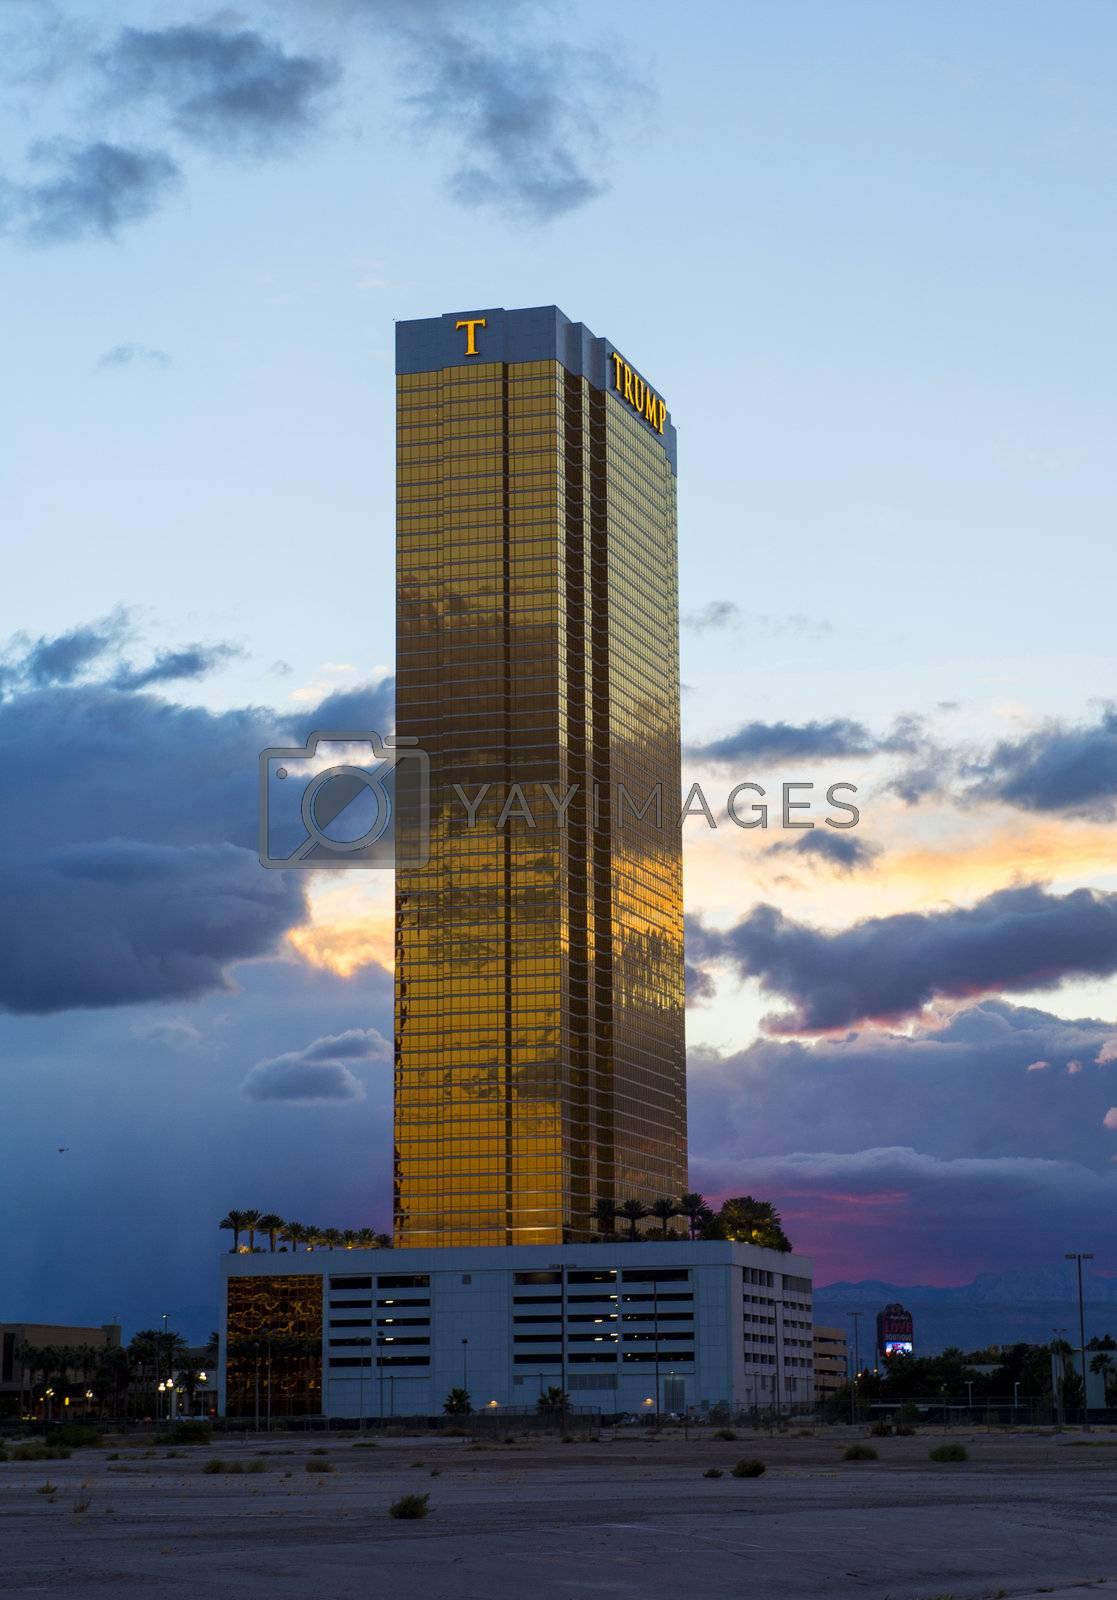 LAS VEGAS - NOVEMBER 08: Hotel Trump on November 08, 2012 in Las Vegas. Las Vegas in 2012 is projected to break the all-time visitor volume record of 39-plus million visitors